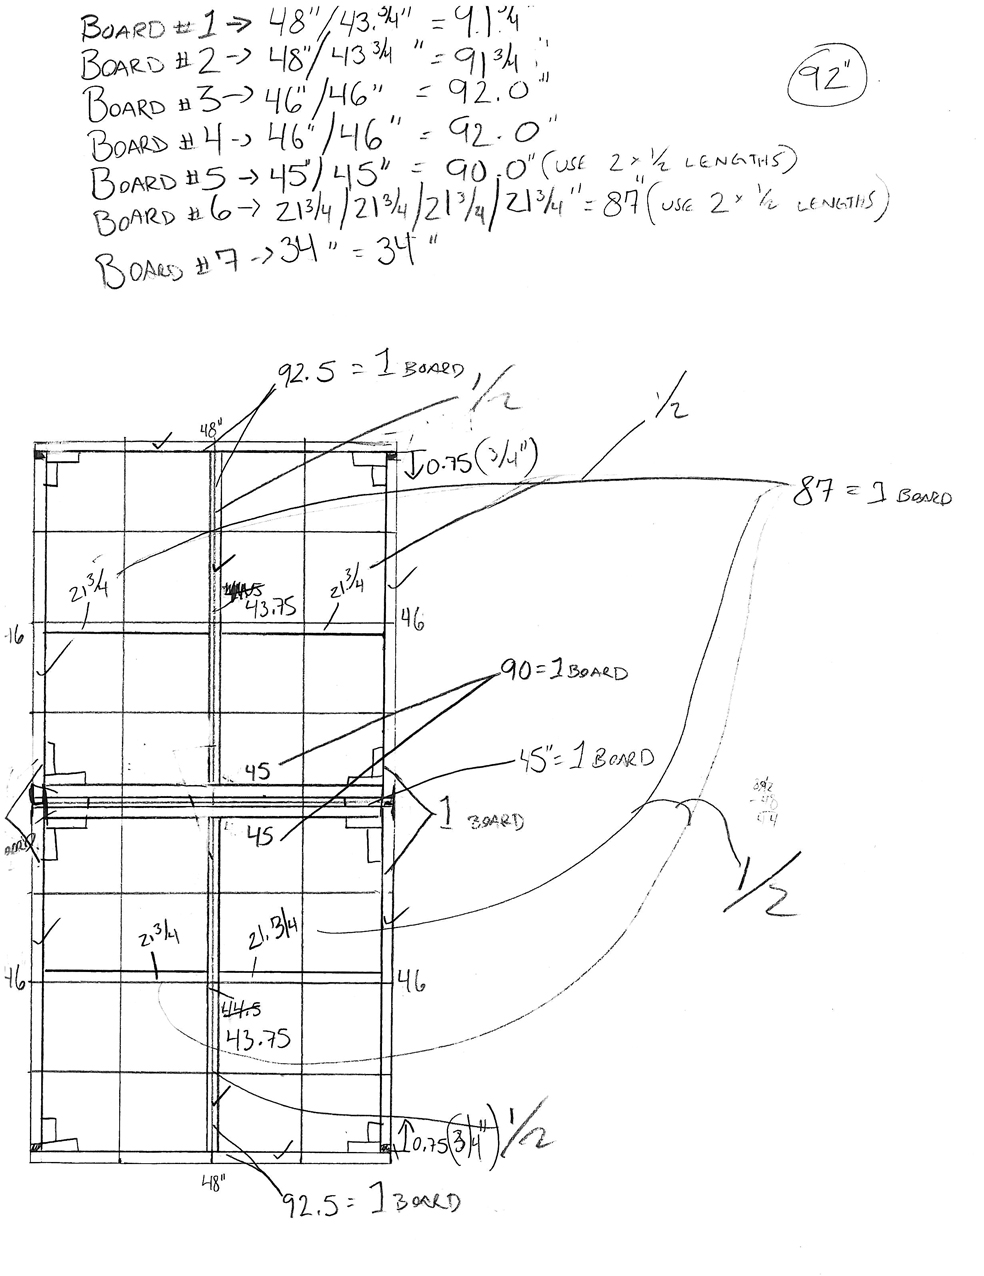 planning 4 x 8 benchwork [ 984 x 1276 Pixel ]